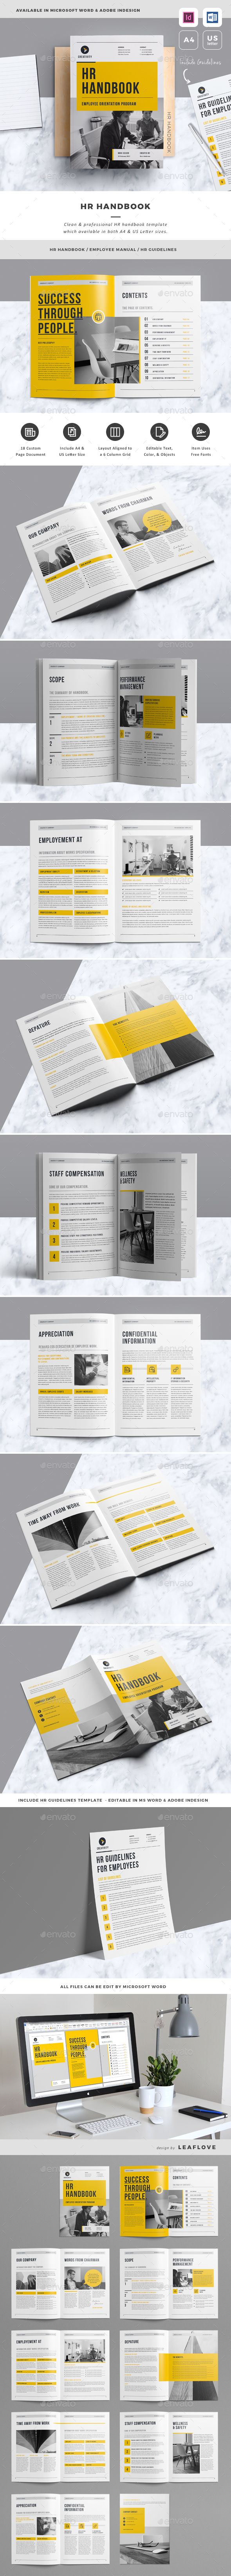 HR Handbook Template InDesign INDD - A4 & US Letter Size